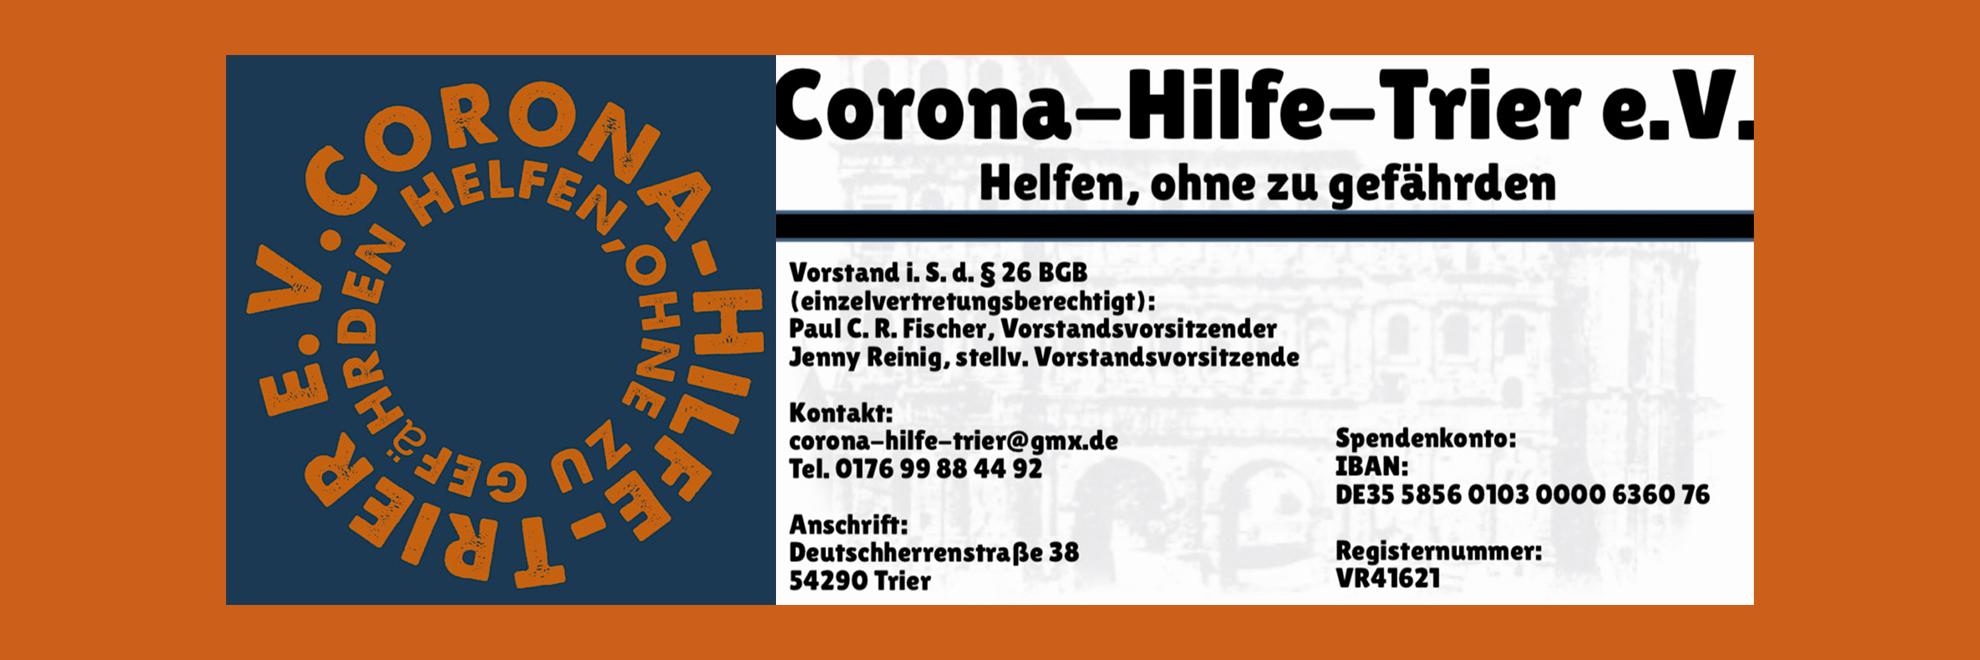 Corona-Hilfe-Trier e.V.